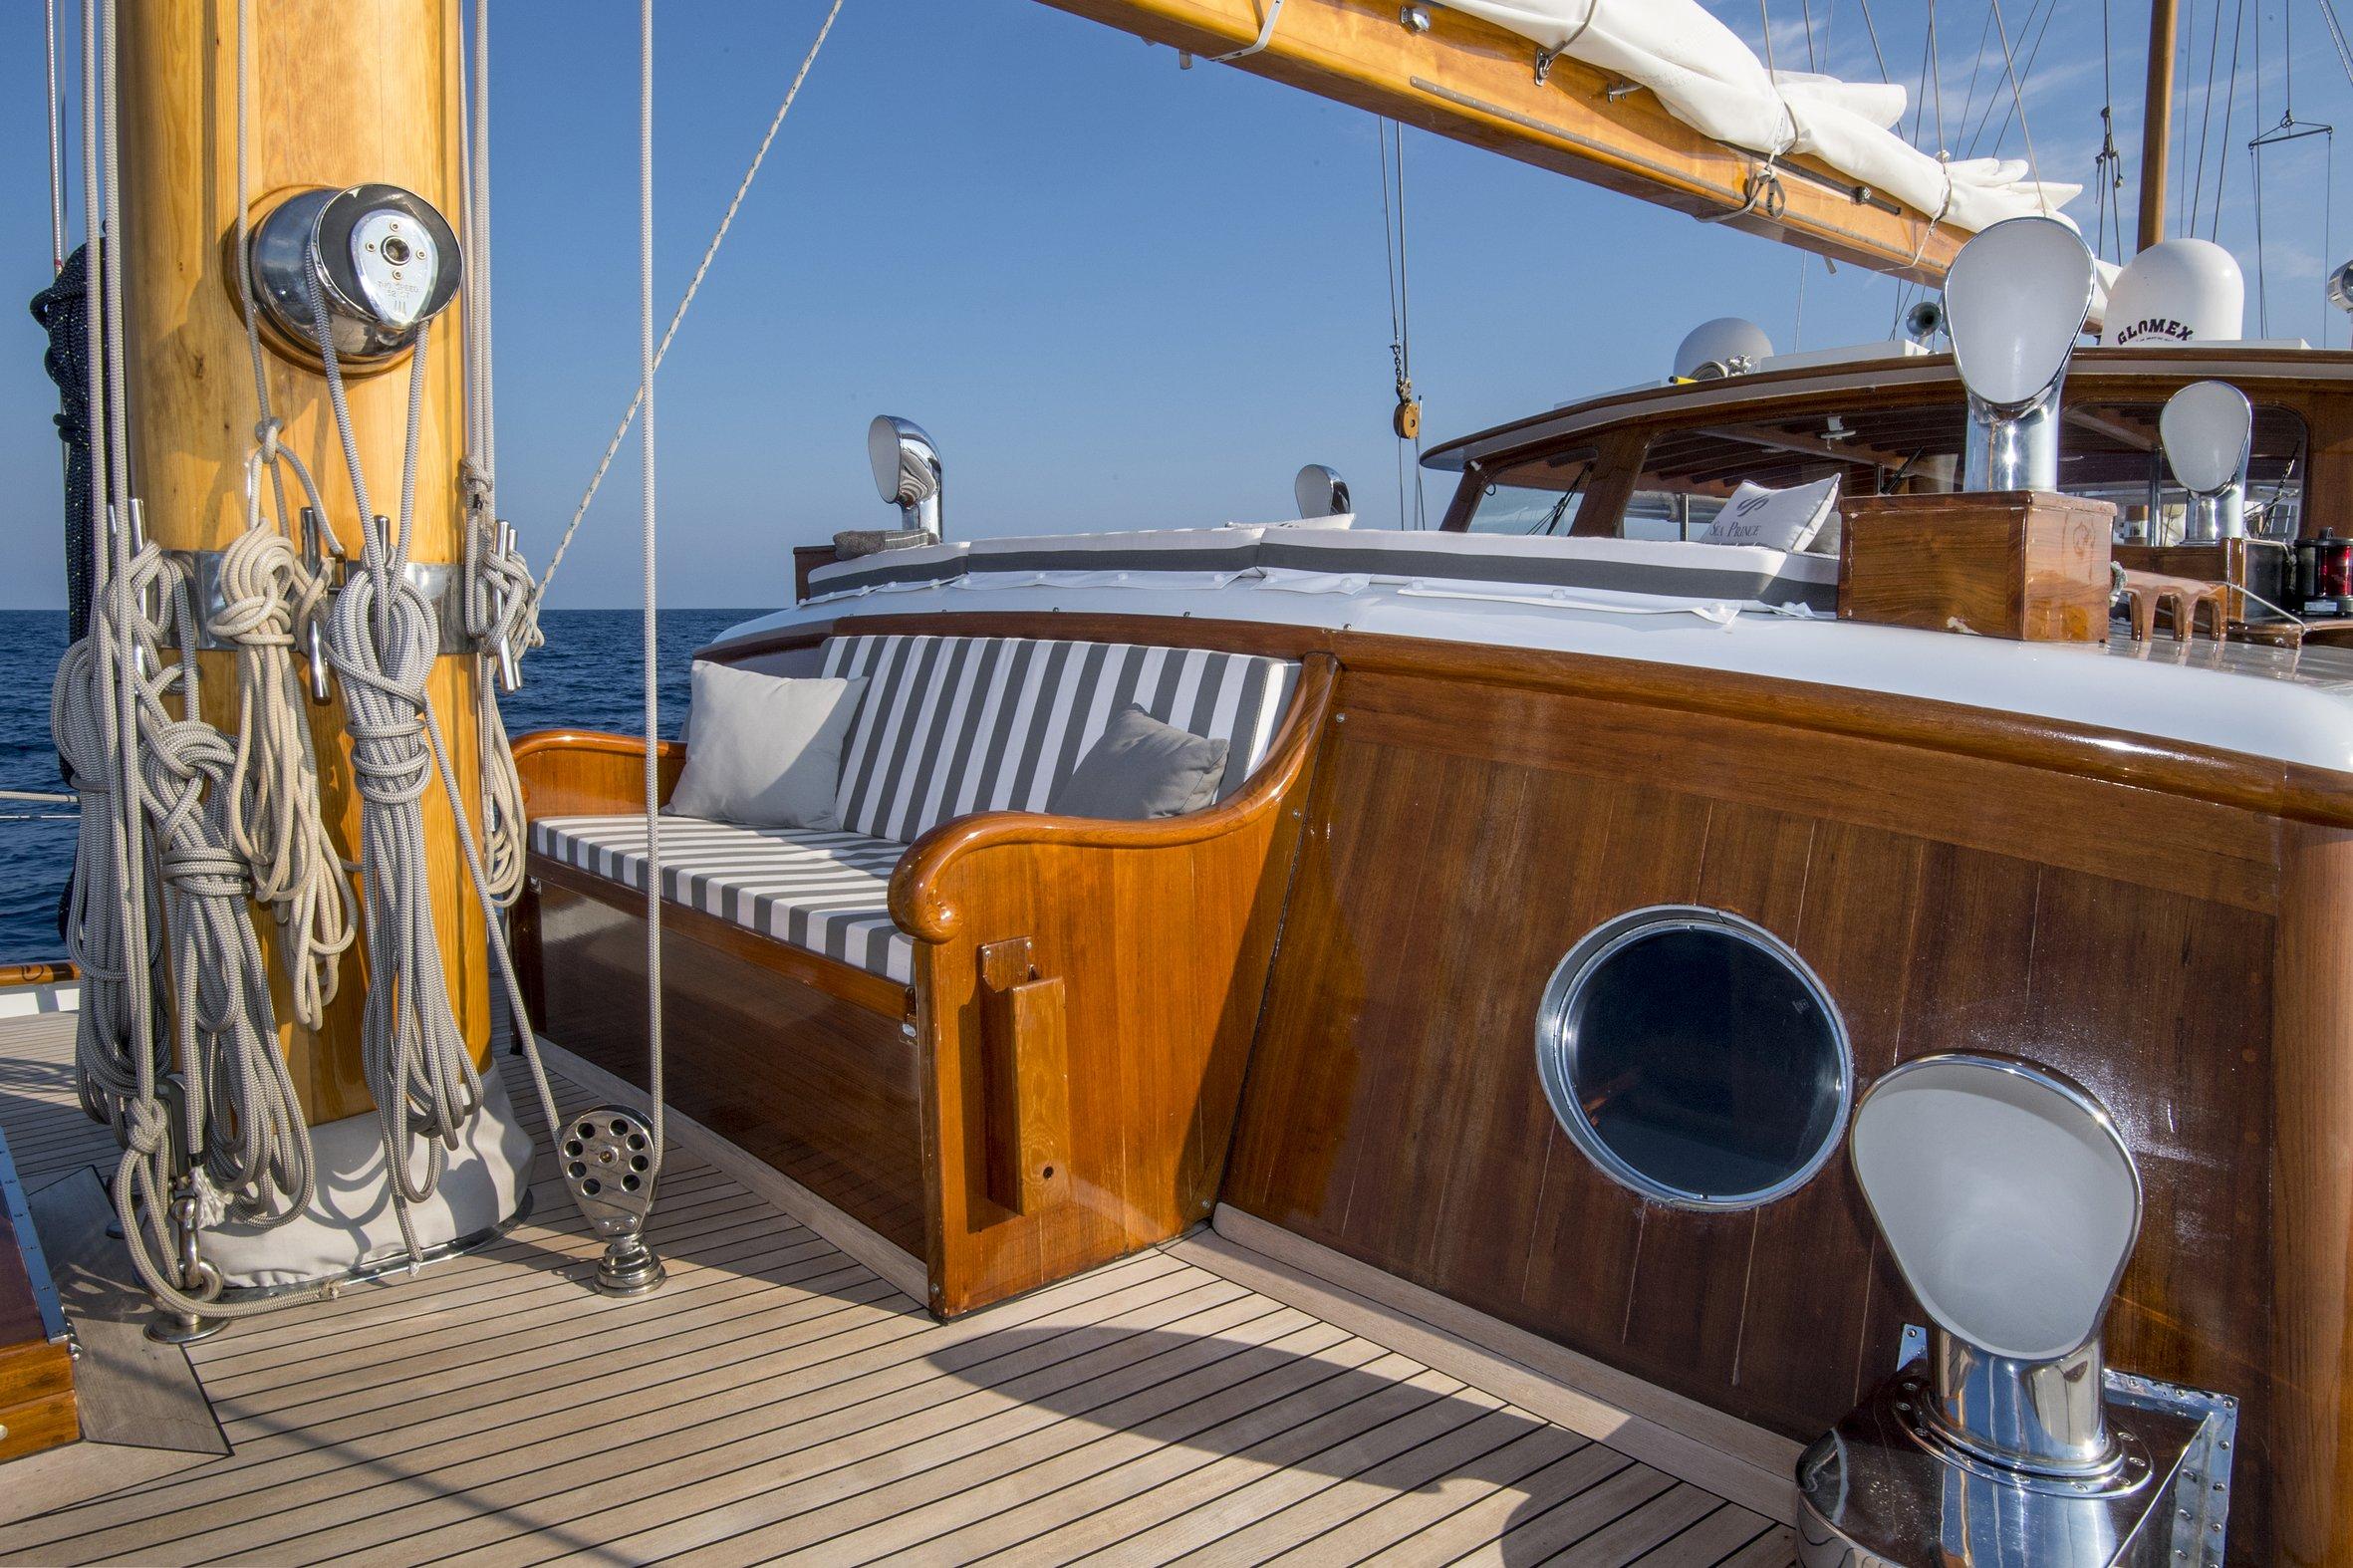 seaprince_deck471_phBluePassion.jpg